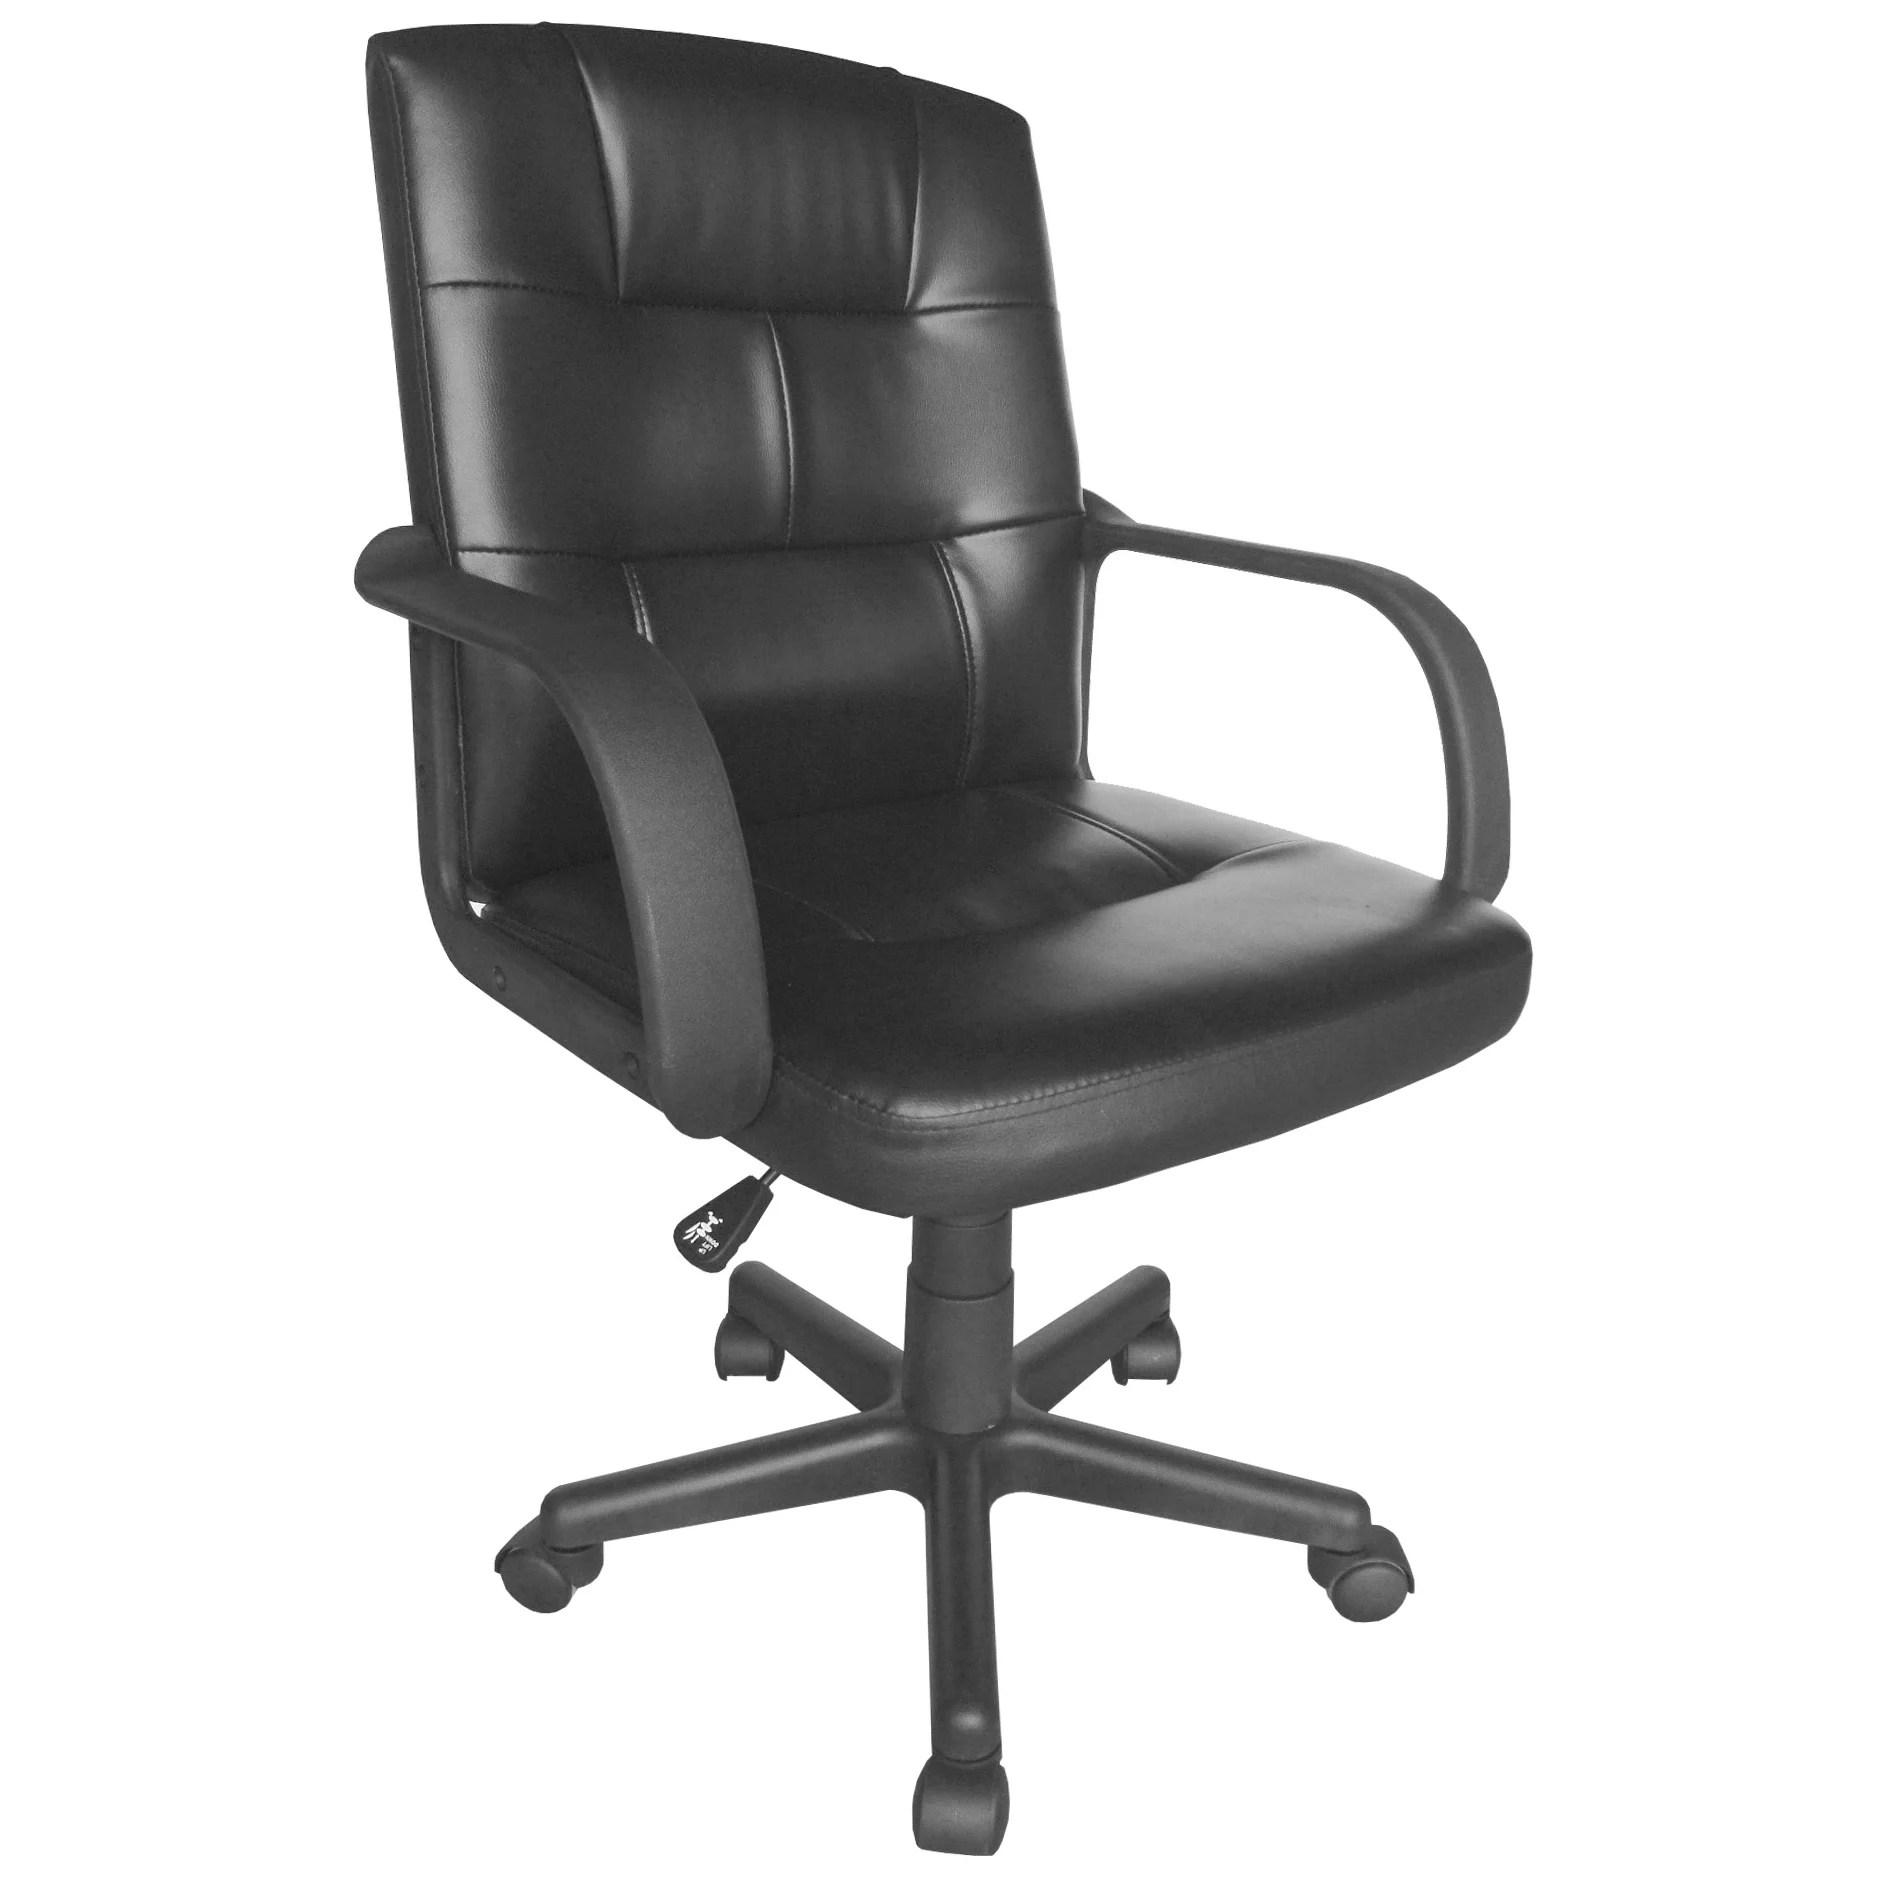 Samsonite Executive Leather Office Chair Samsonite Orleans Bonded